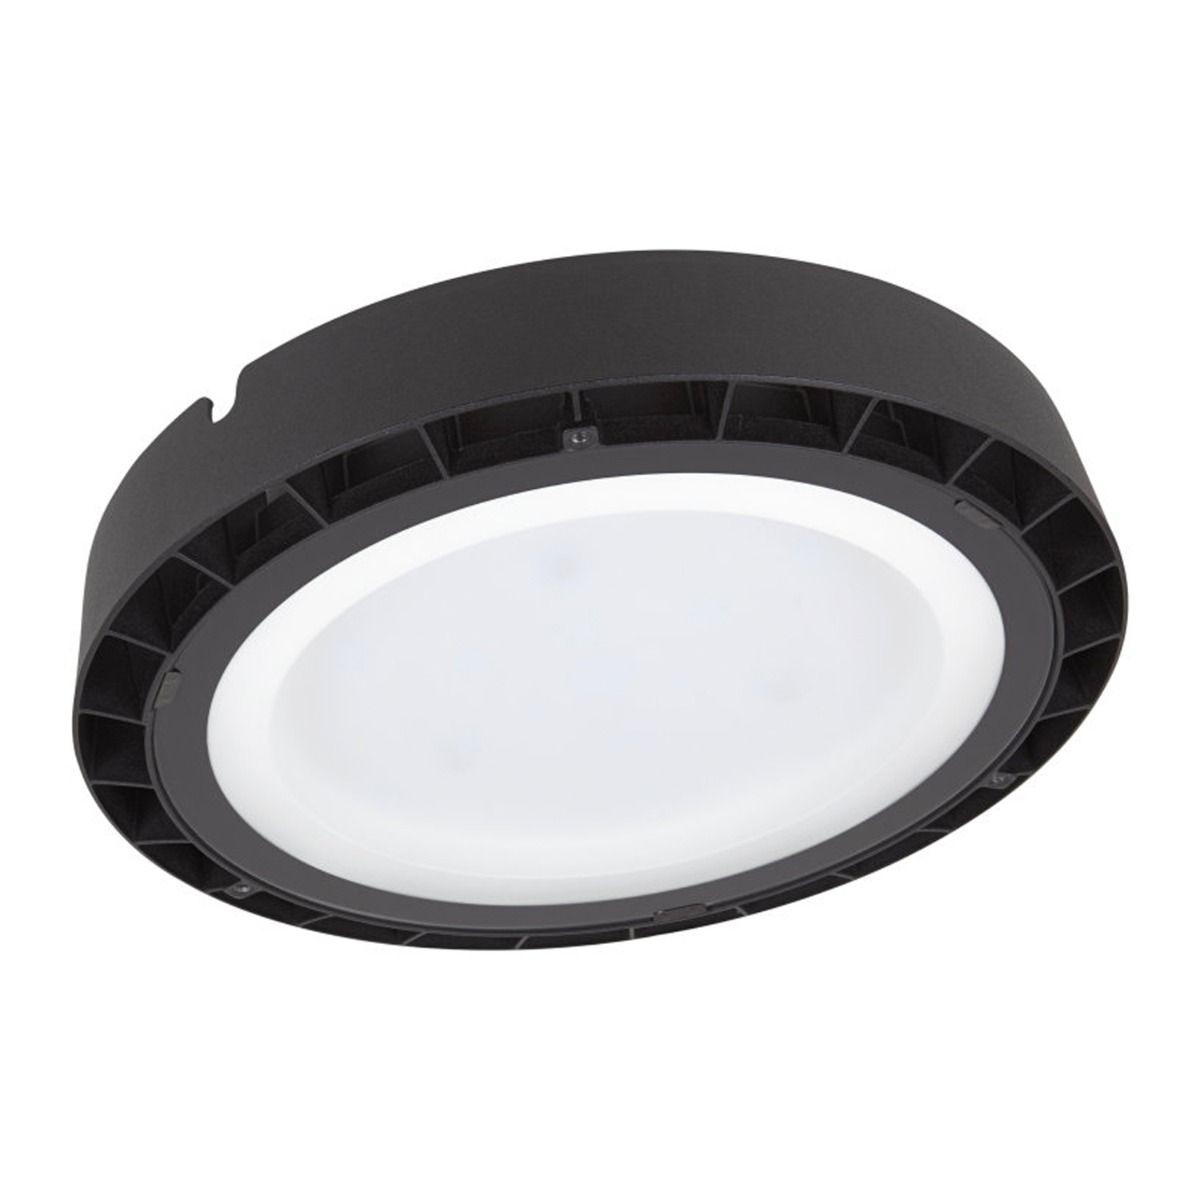 Ledvance LED High Bay Value 150W 6500K IP65 16000lm 100D | Replacer for 250W